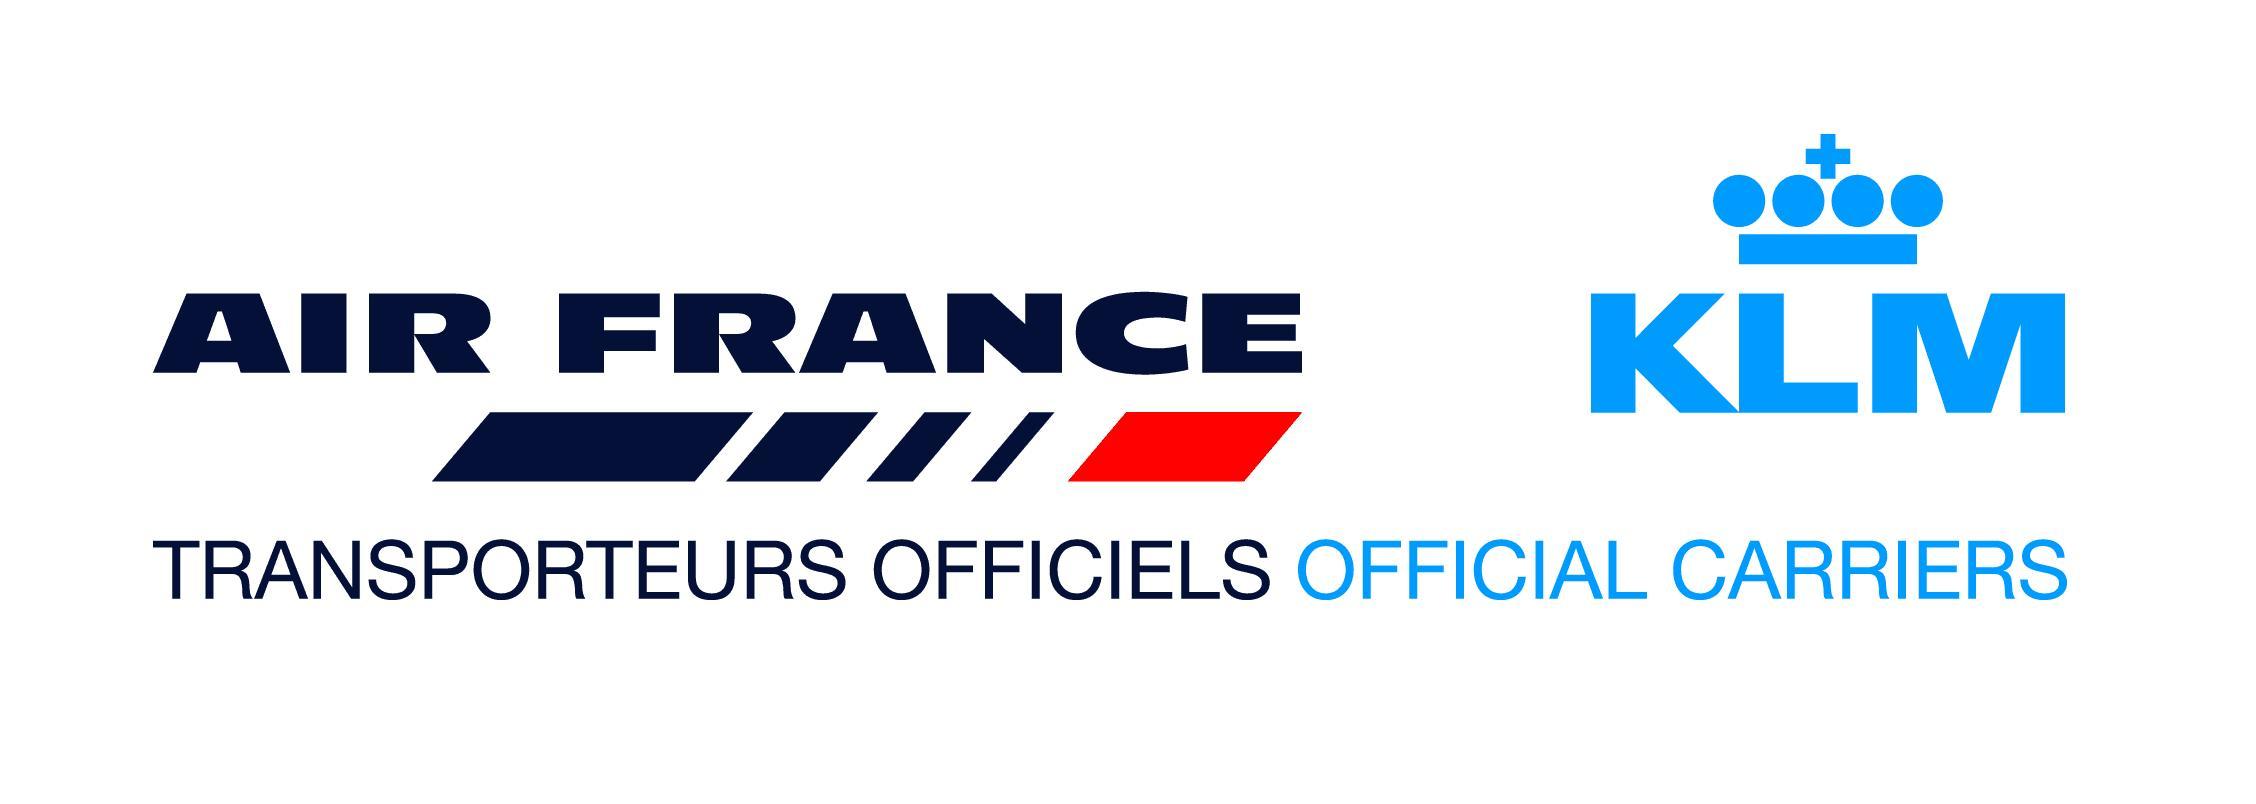 Logo Air France Klm PNG - 111263